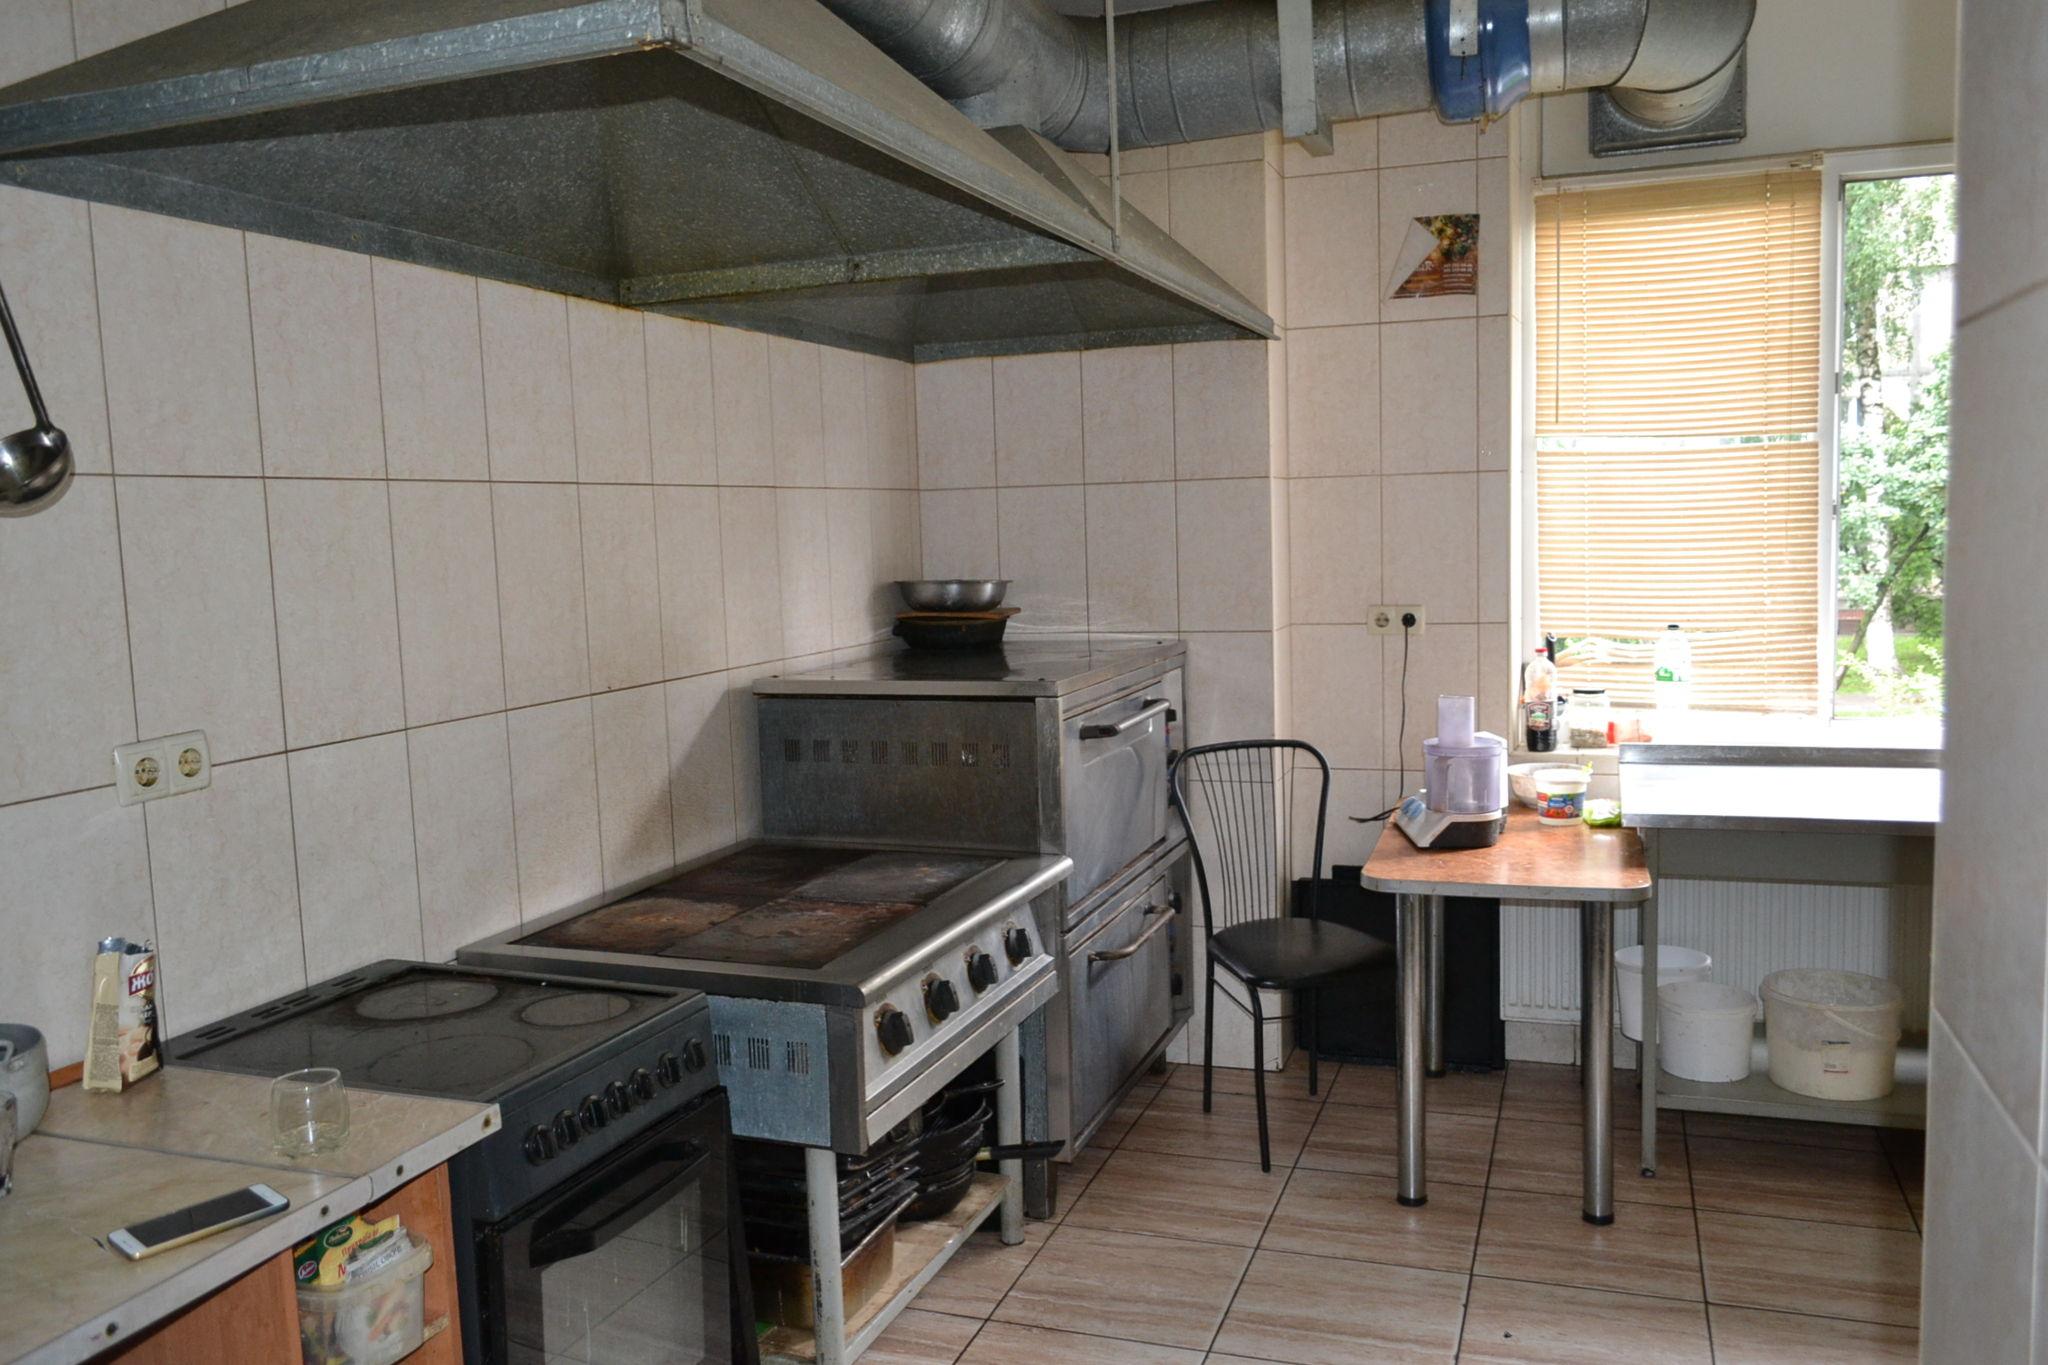 Ресторан, W-5563321, Чаадаева Петра, 2, Киев - Фото 9